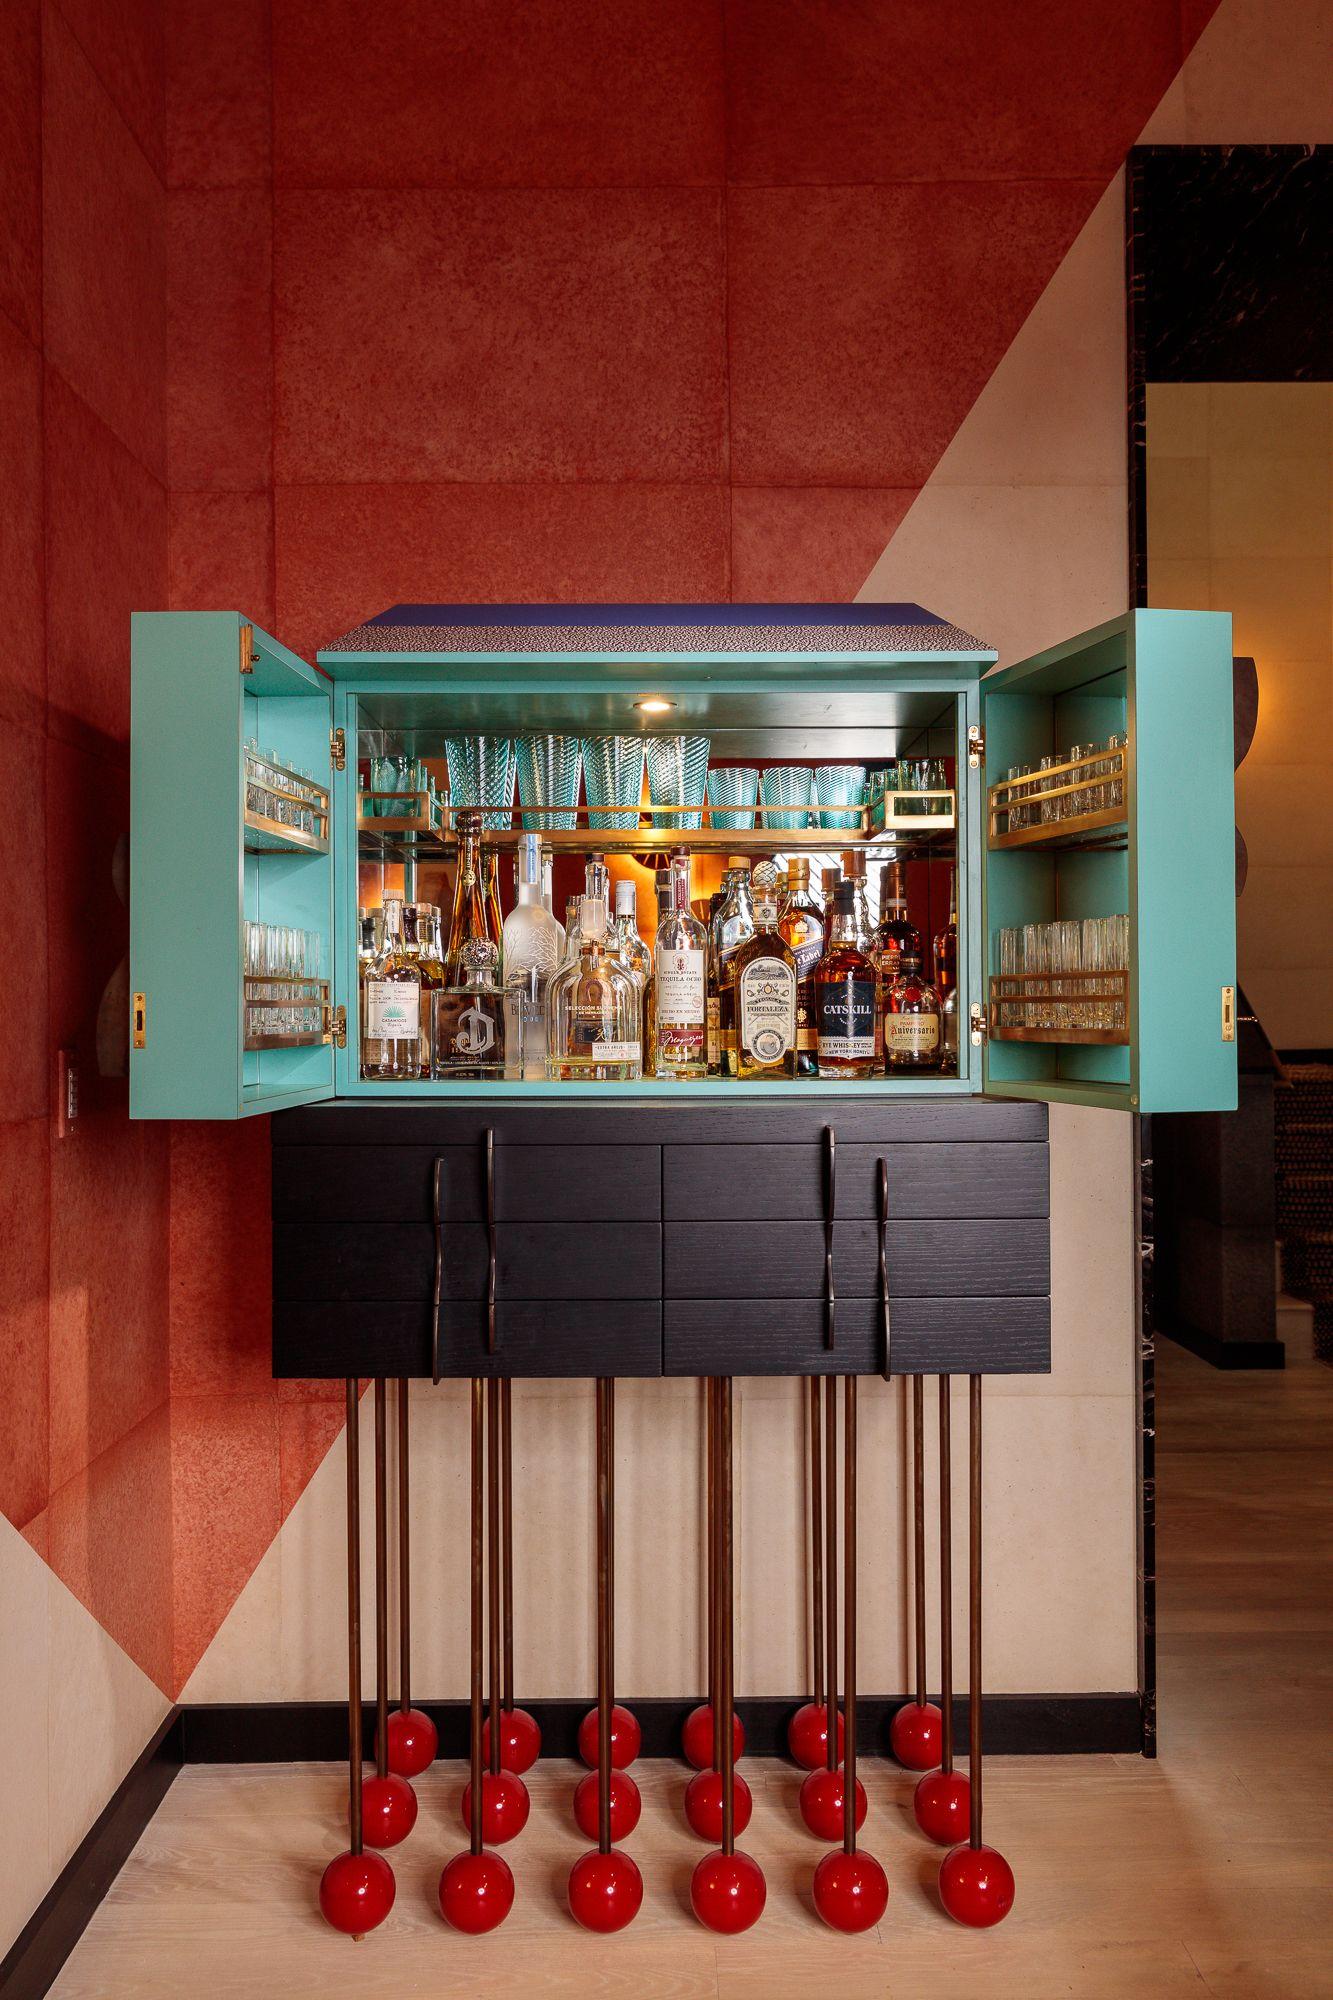 Memphis Style Bar Cart | Kelly wearstler interiors, Artistic furniture,  Furniture design modern